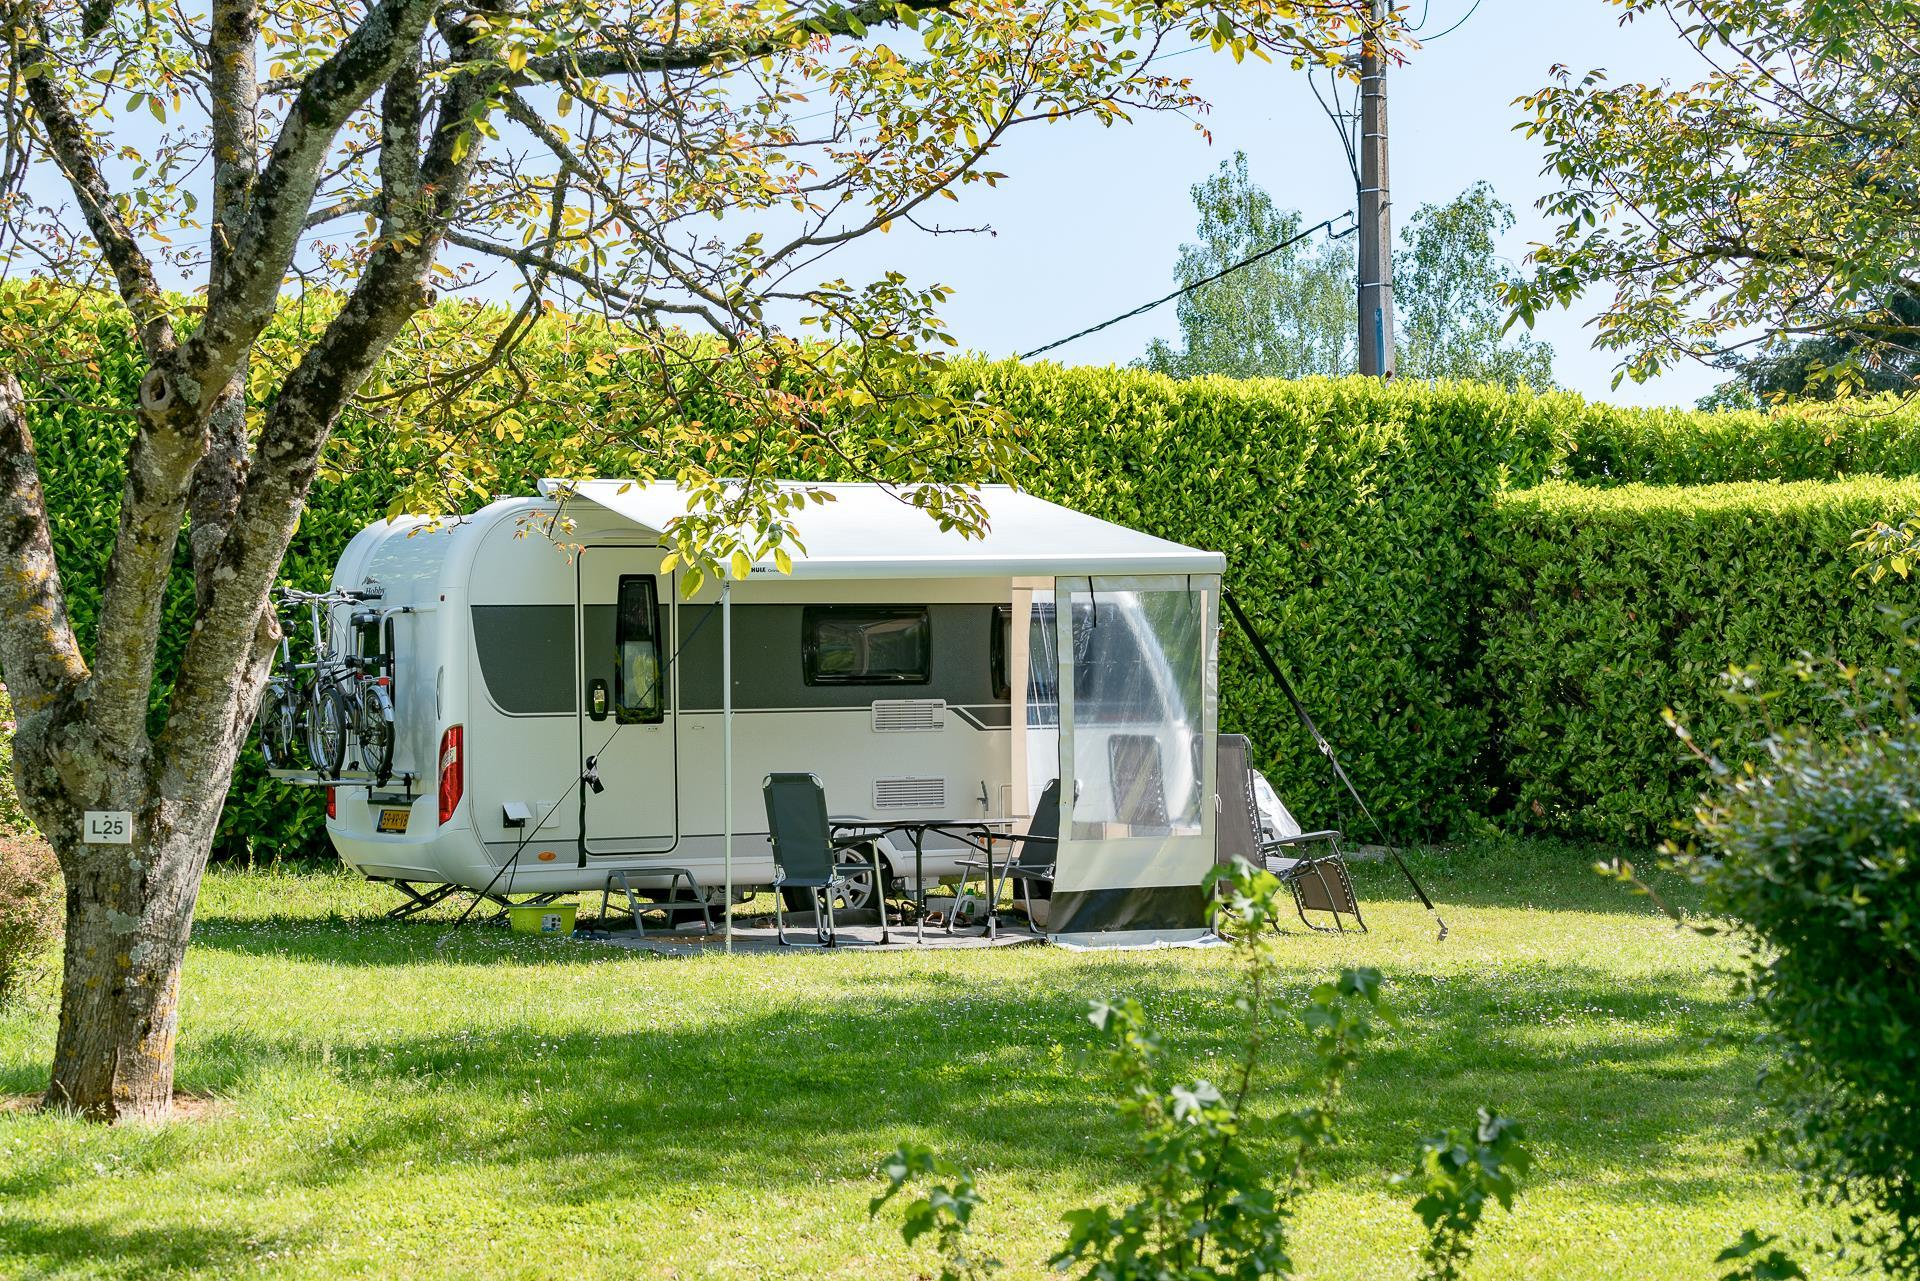 Emplacement - Forfait Emplacement ** - Camping Sandaya Les Péneyrals